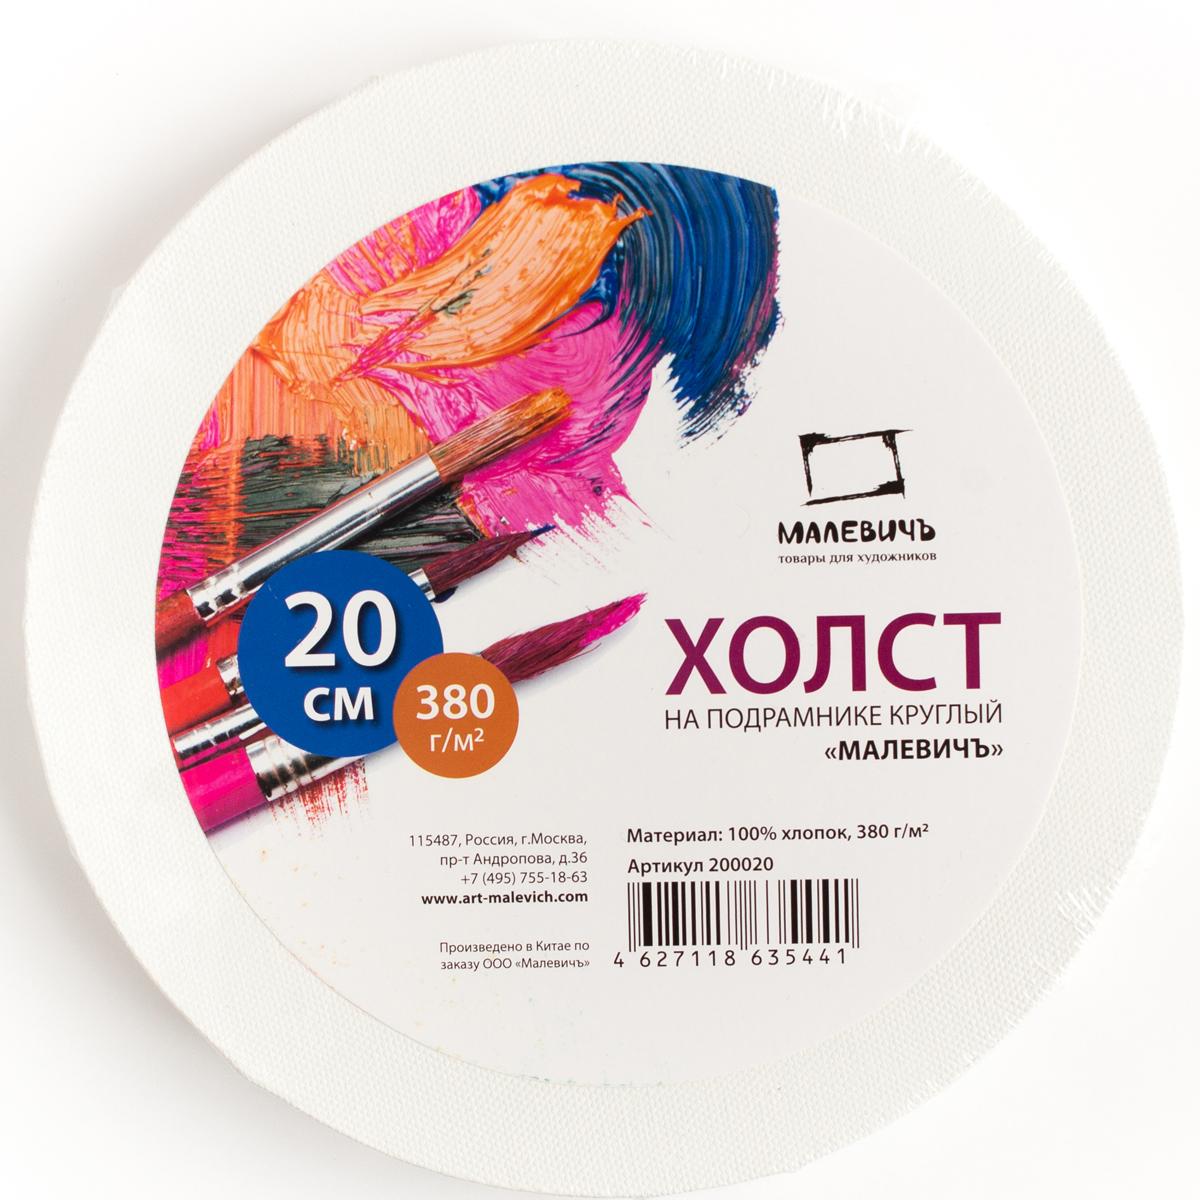 Малевичъ Холст на подрамнике круглый диаметр 20 см 380 г/м2